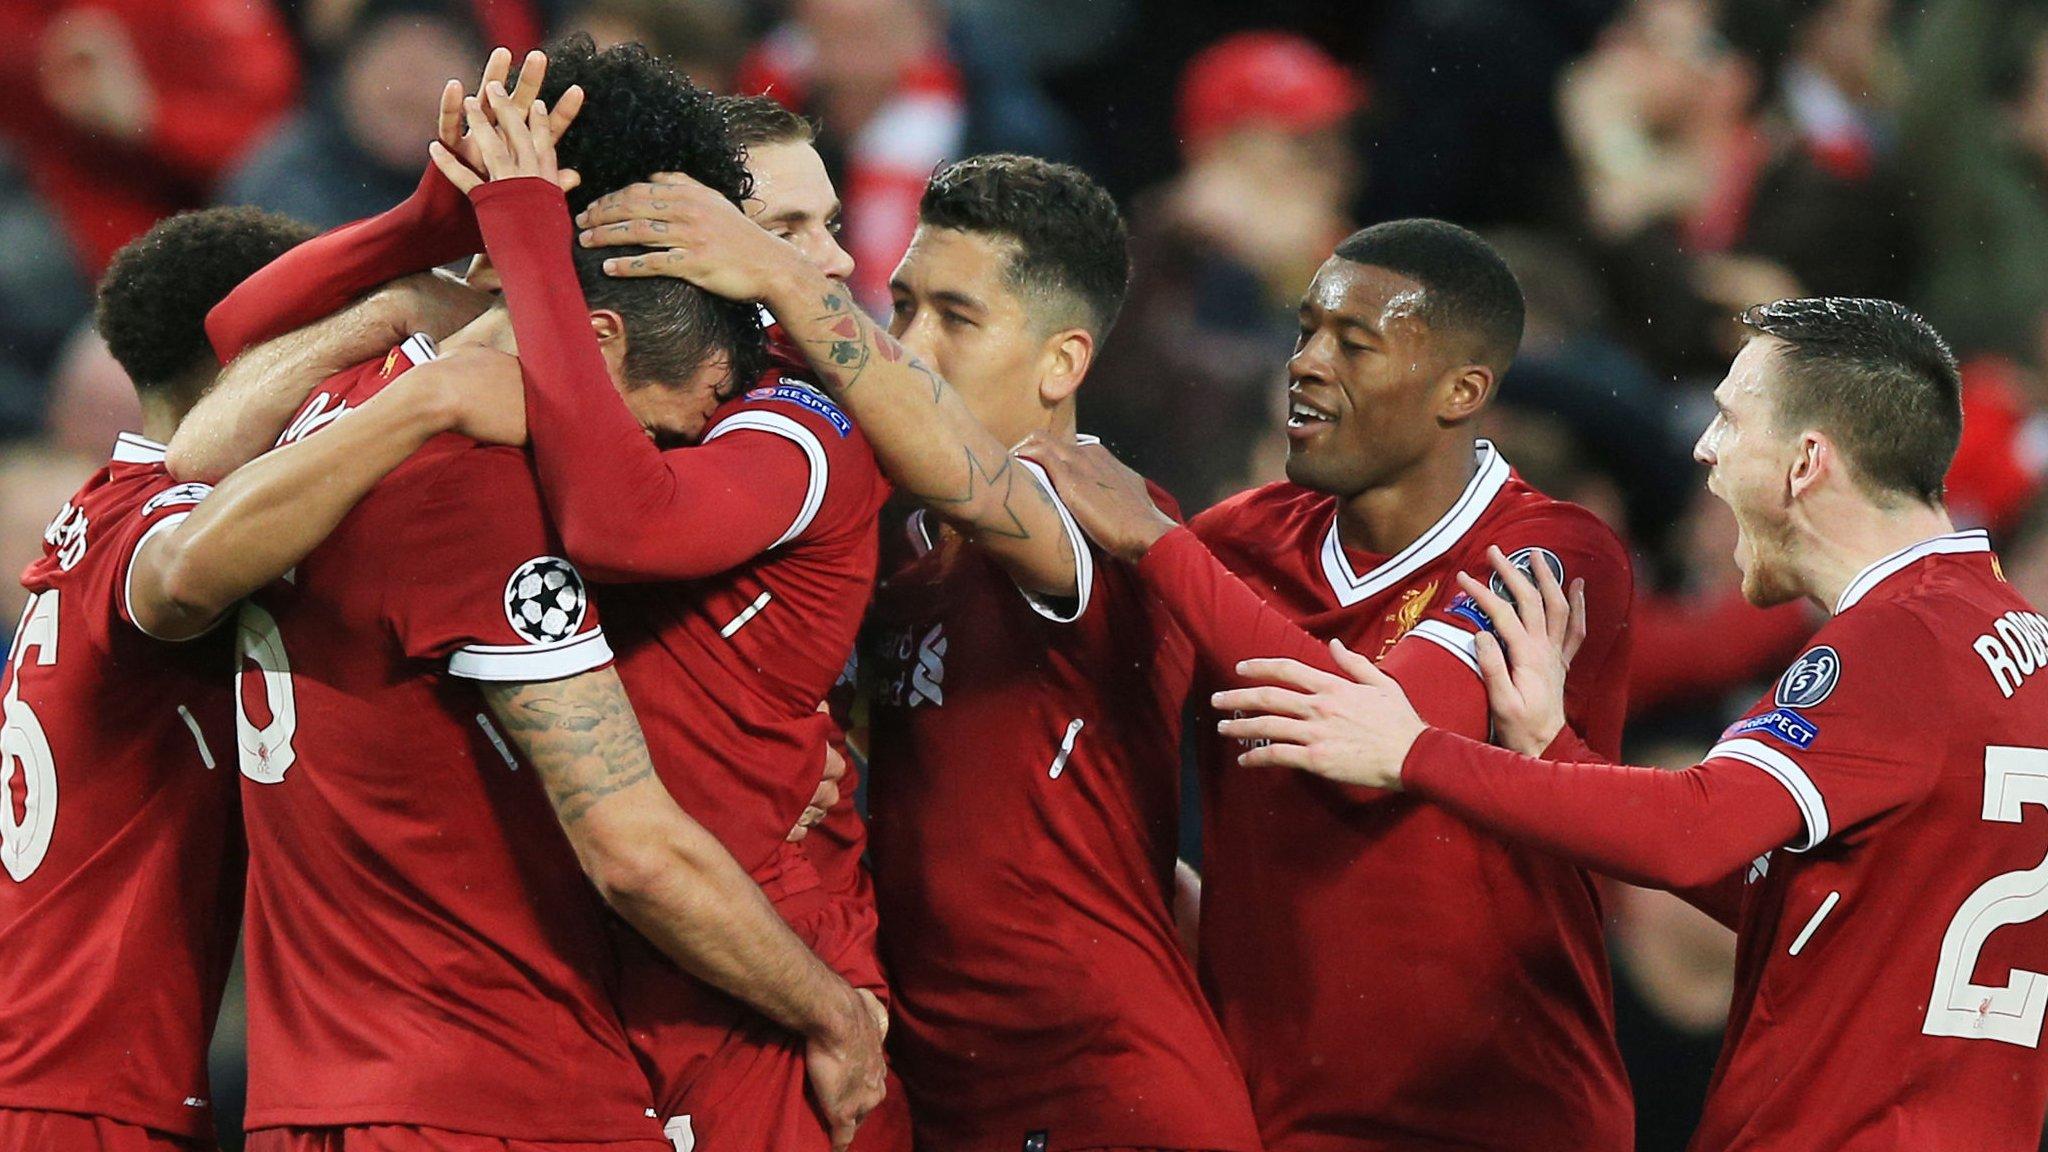 Liverpool 5-2 Roma: Win unlike any football I've seen before - Lawrenson